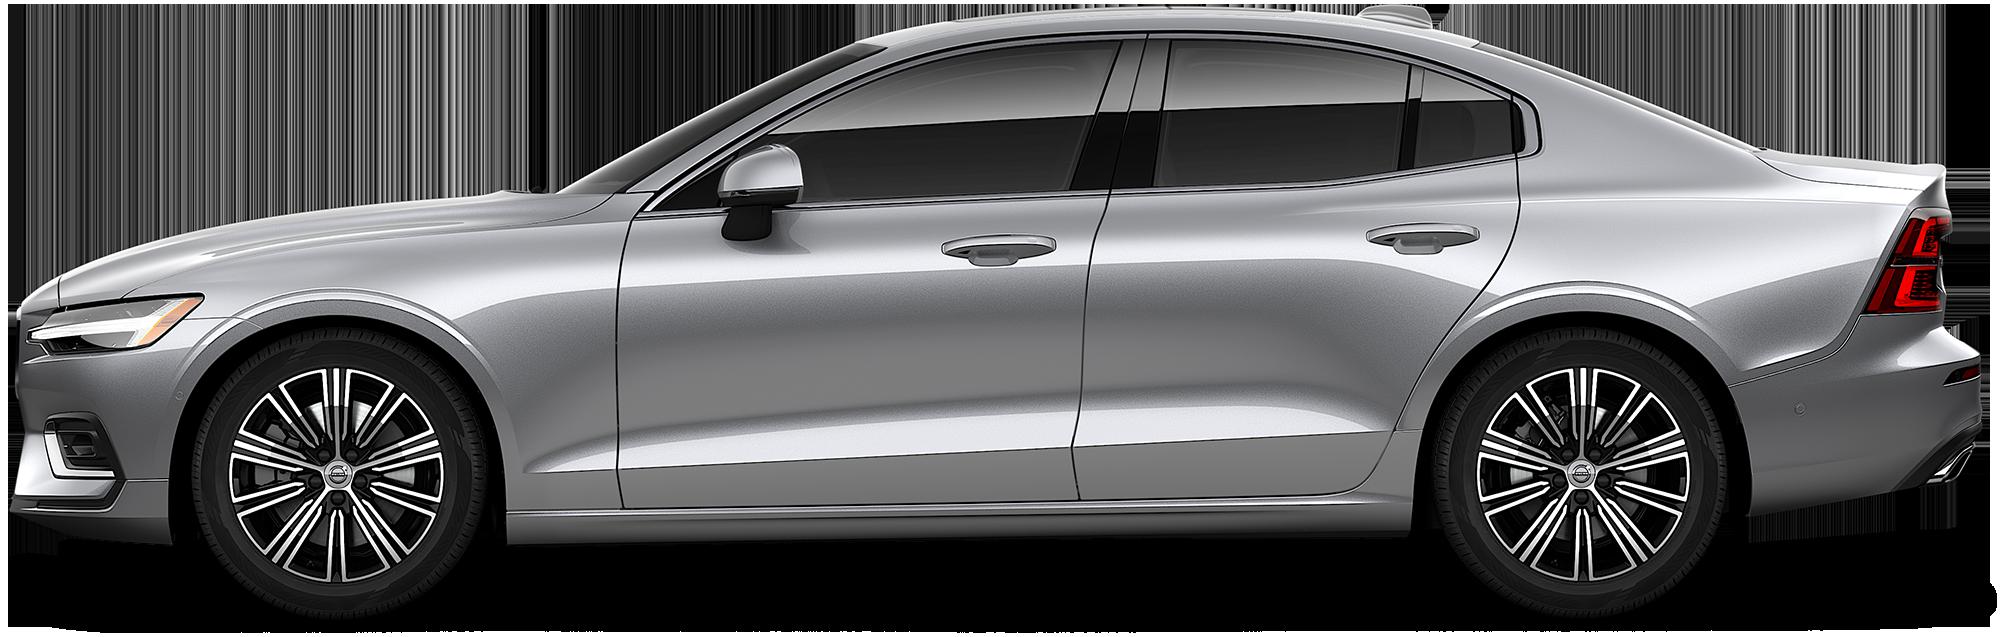 2022 Volvo S60 Sedan B5 FWD Inscription